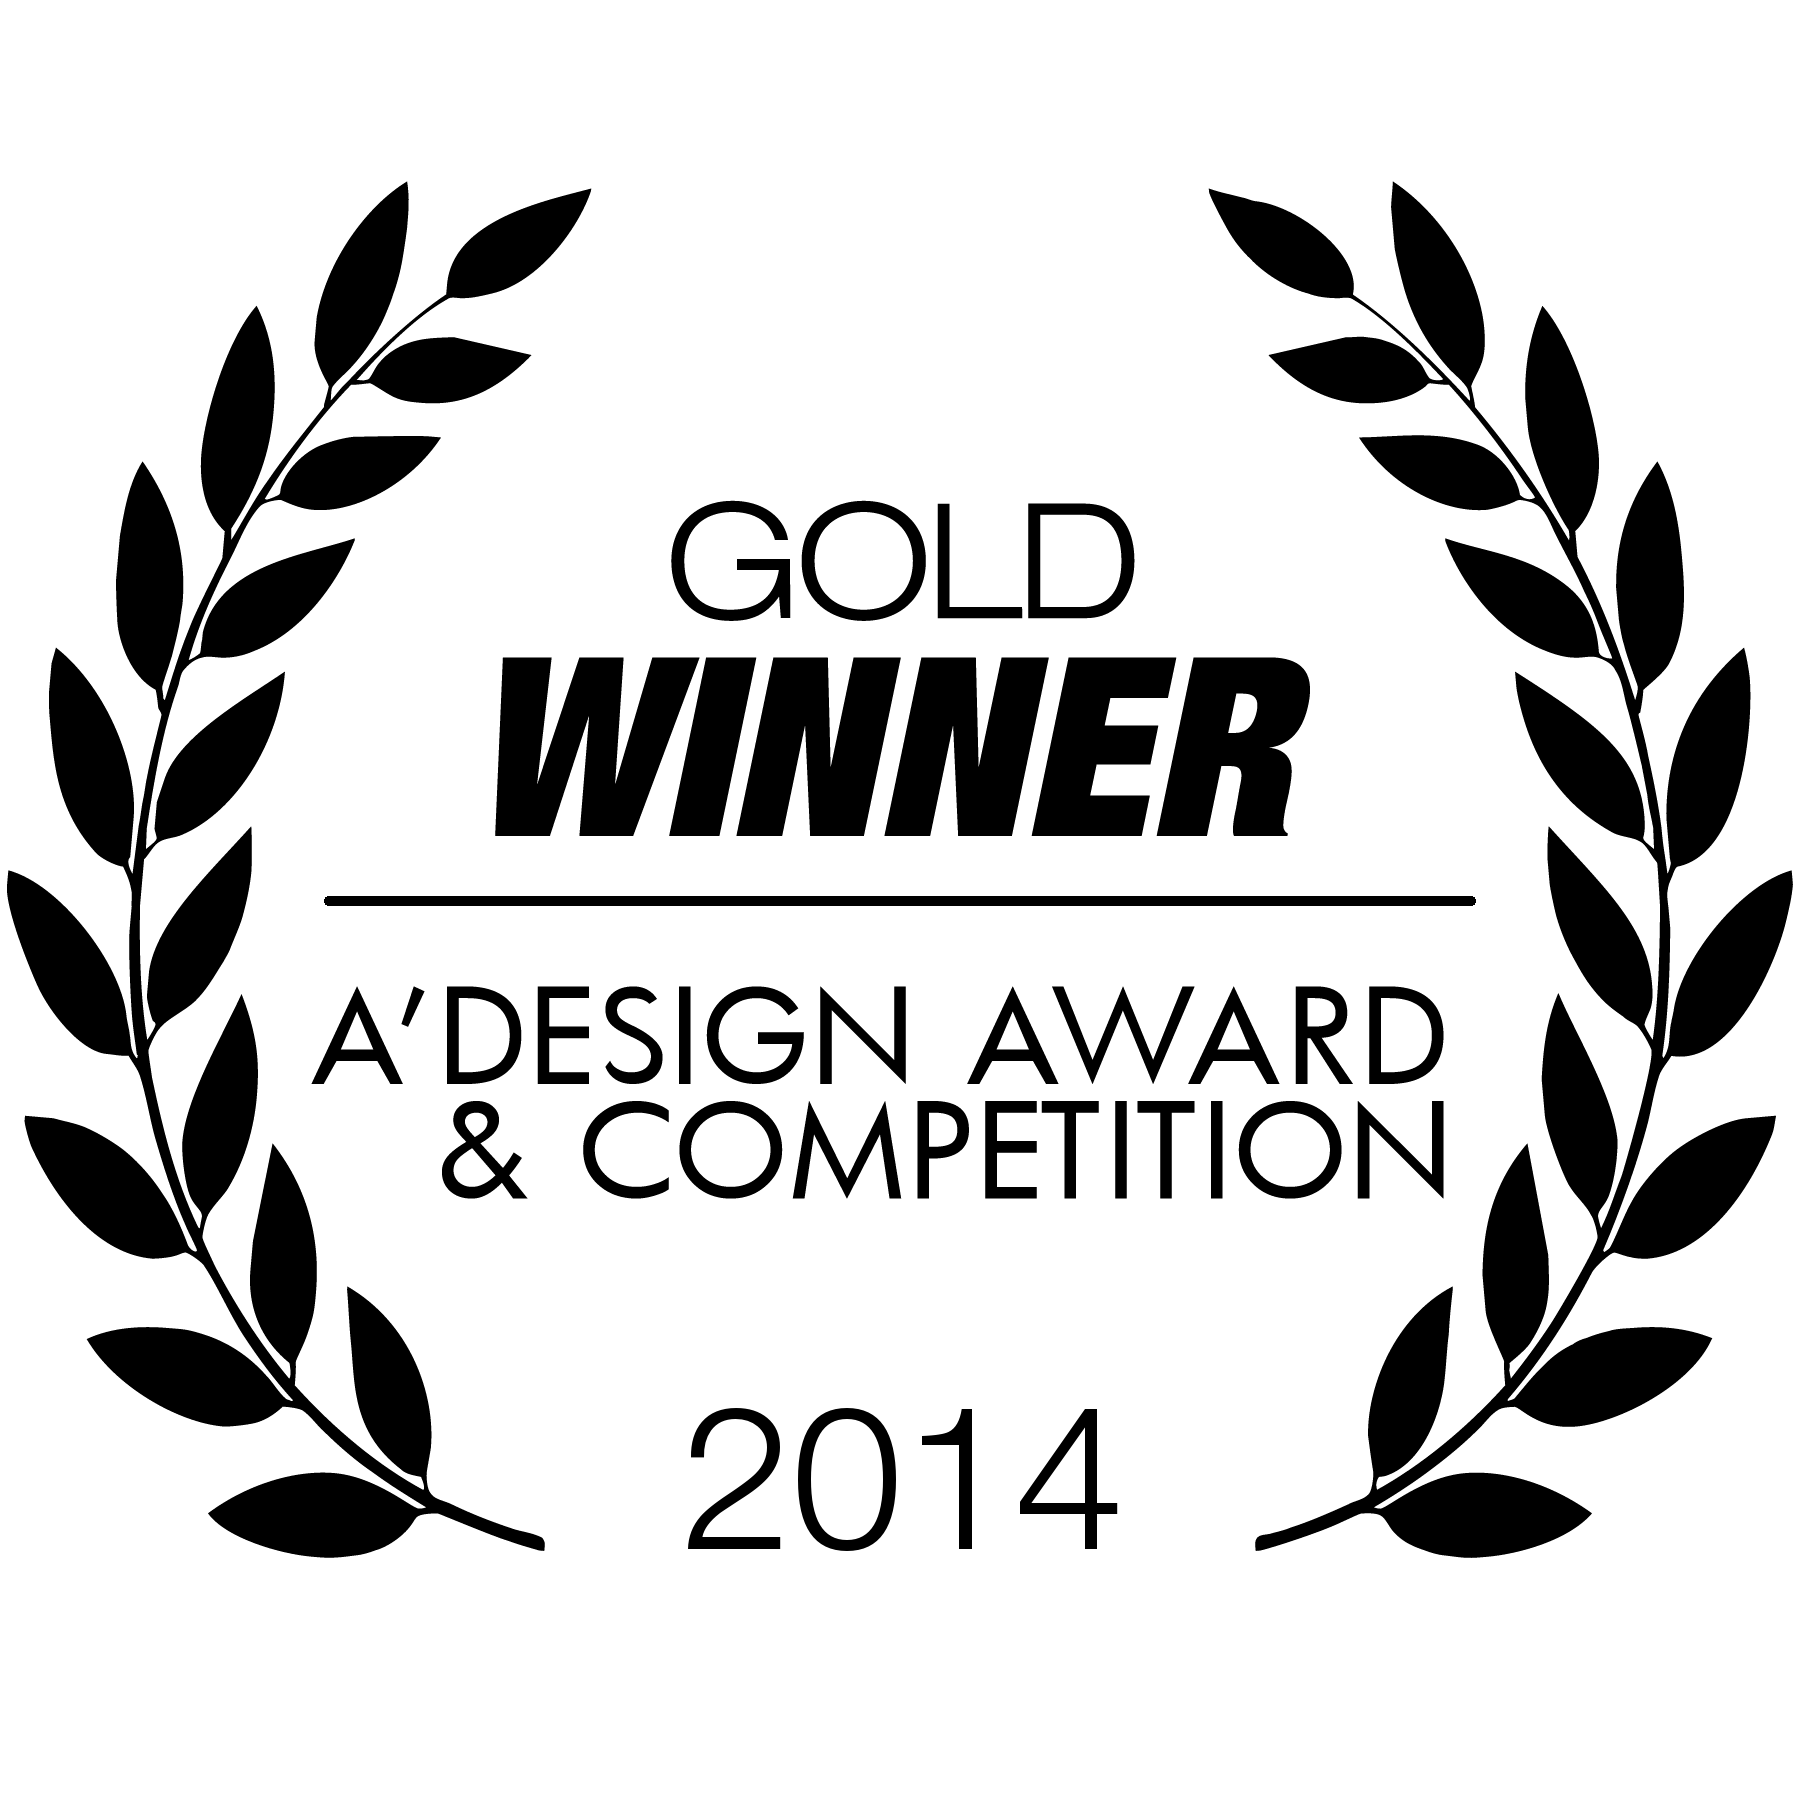 30560-logo-laurel-wreath.png